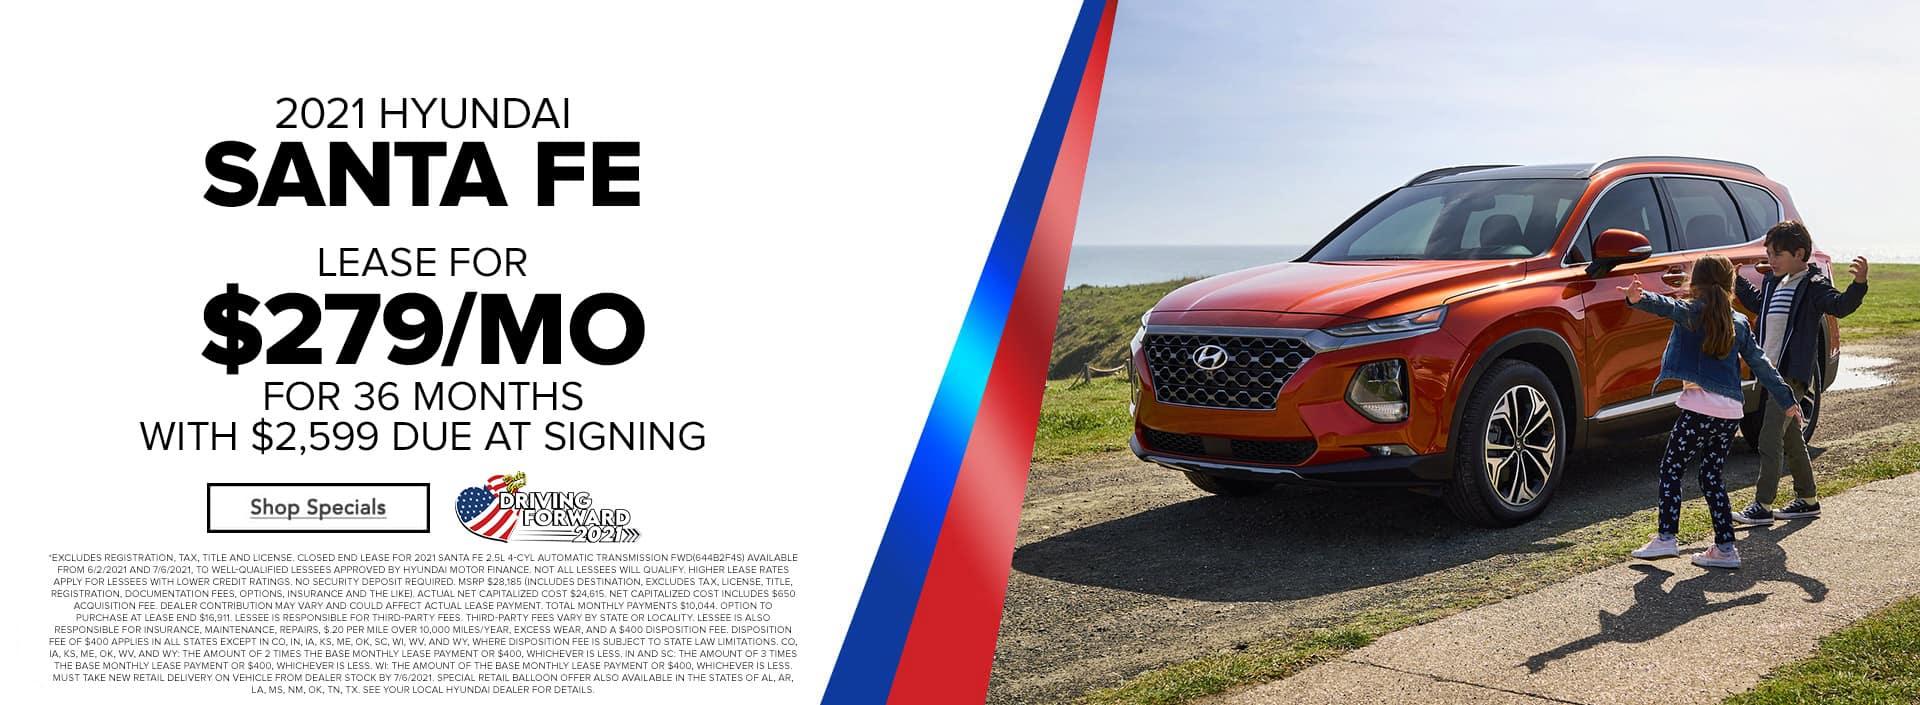 Get Great Lease Deals On The 2021 Hyundai Santa Fe At Bert Ogden